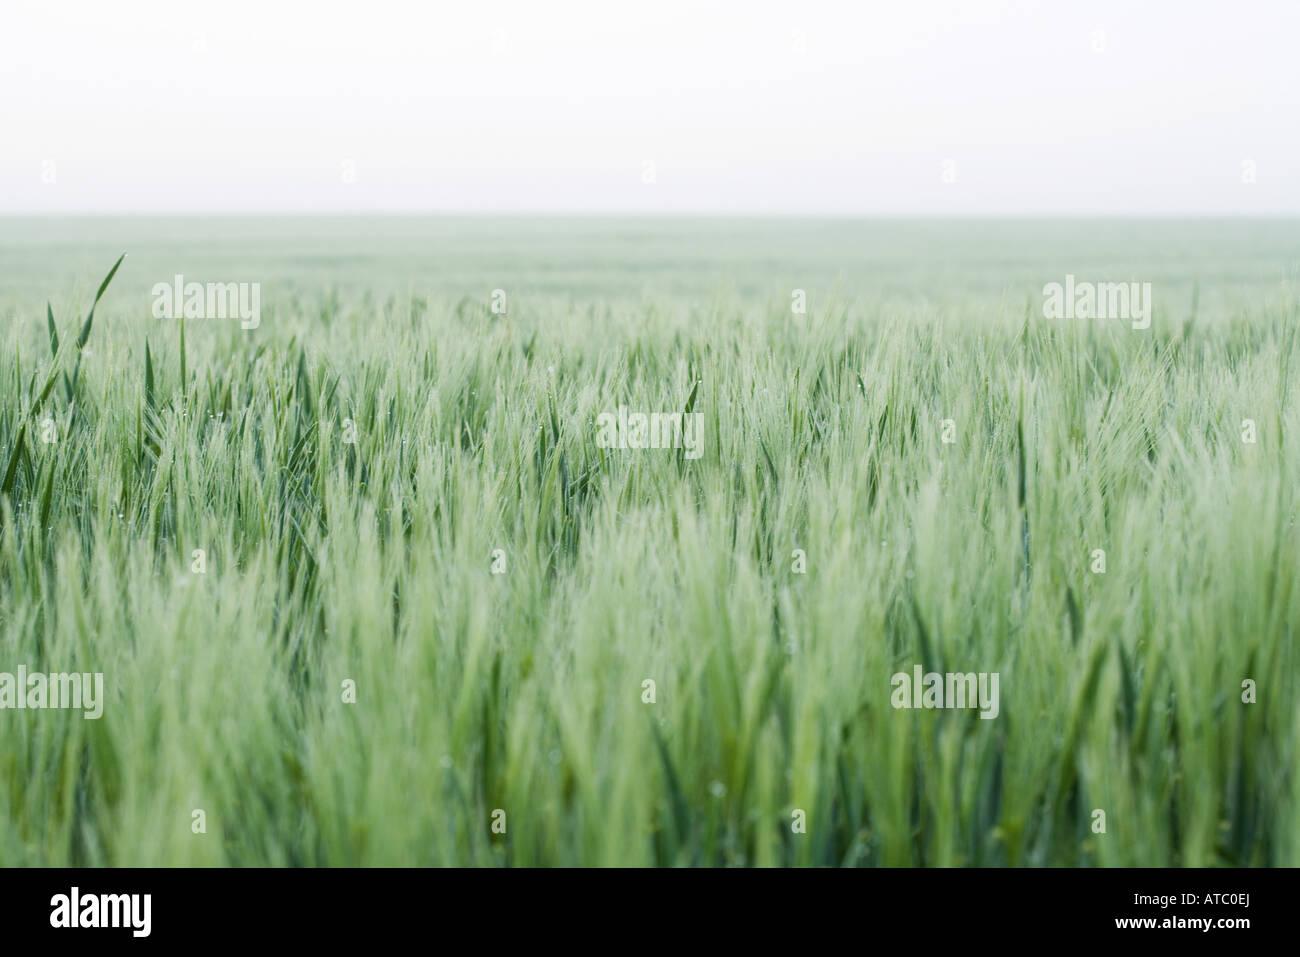 Wheatfield, horizon in background - Stock Image